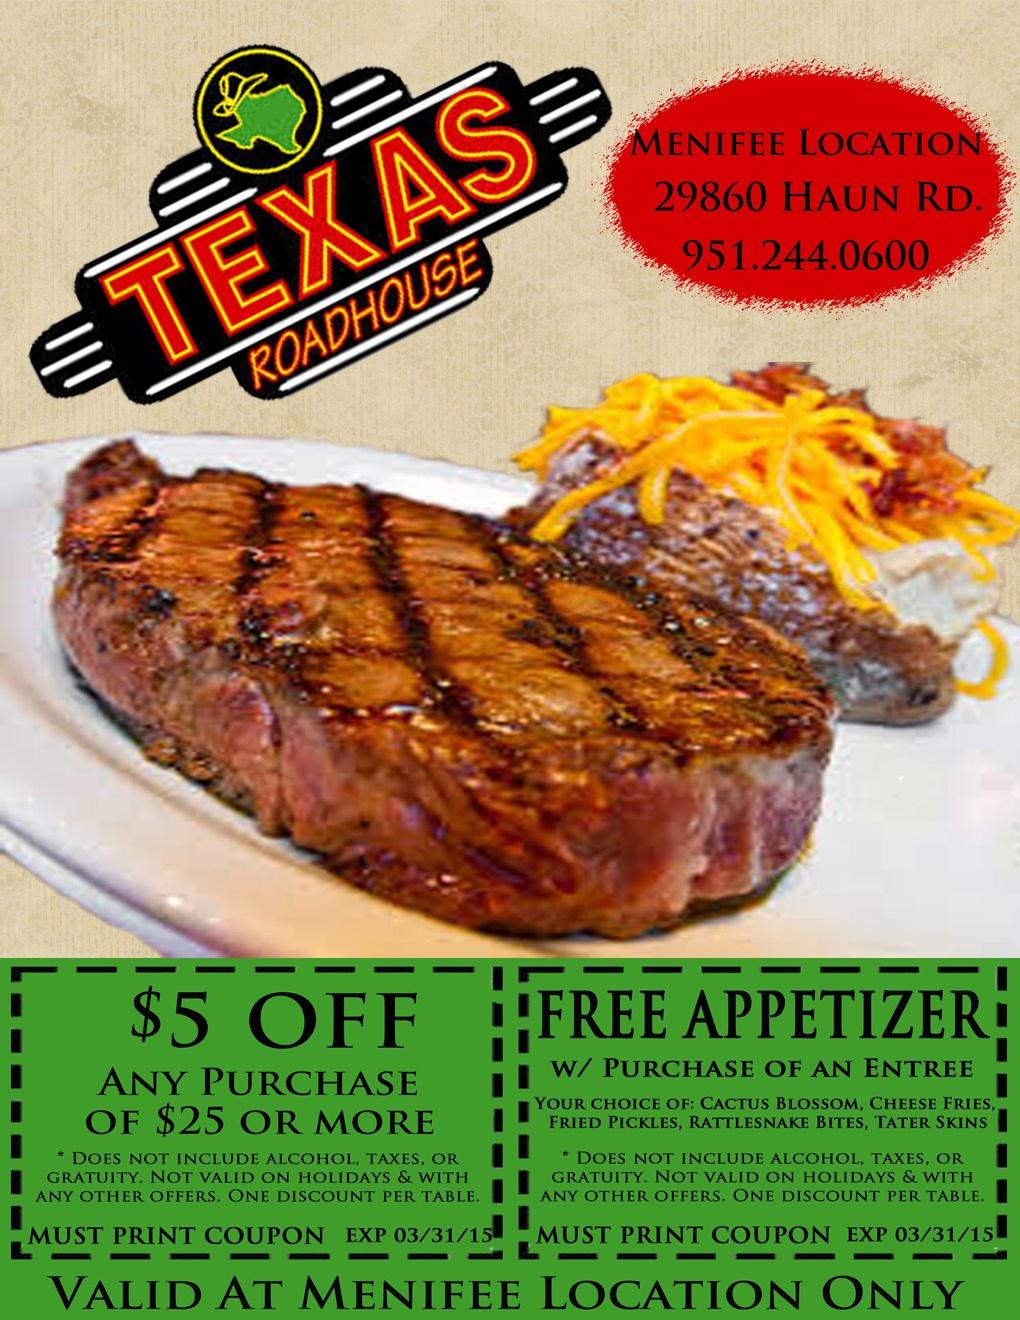 Texas Roadhouse Coupons (10) - Promo & Coupon Codes Updates - Texas Roadhouse Printable Coupons Free Appetizer